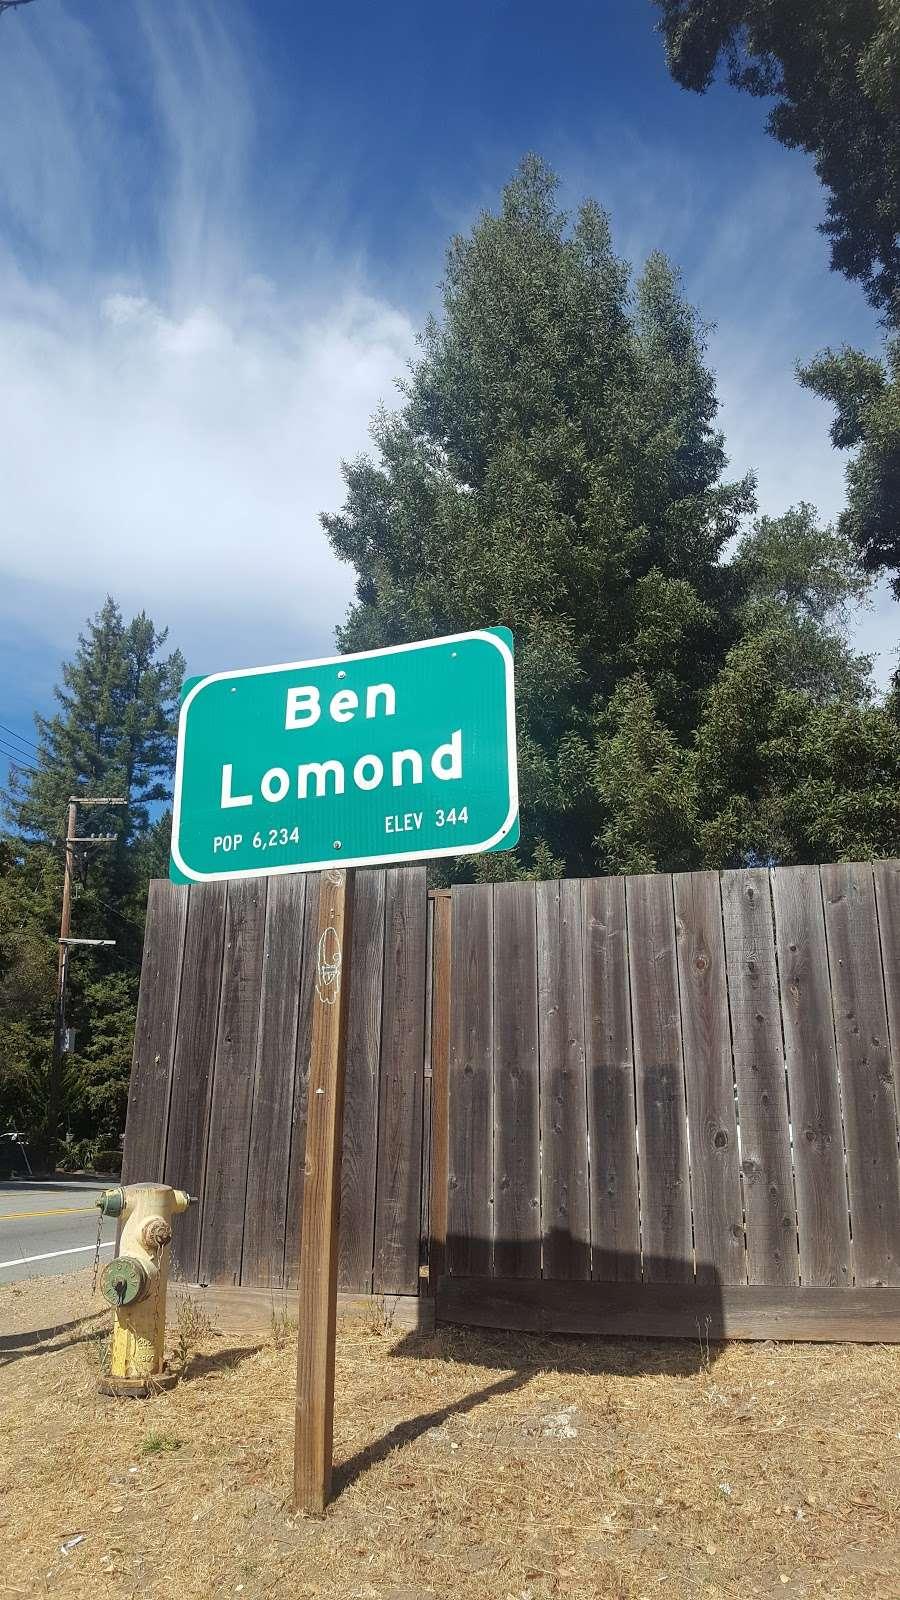 Masoods Liquor & Deli - store  | Photo 8 of 10 | Address: 7970 CA-9, Ben Lomond, CA 95005, USA | Phone: (831) 336-2555